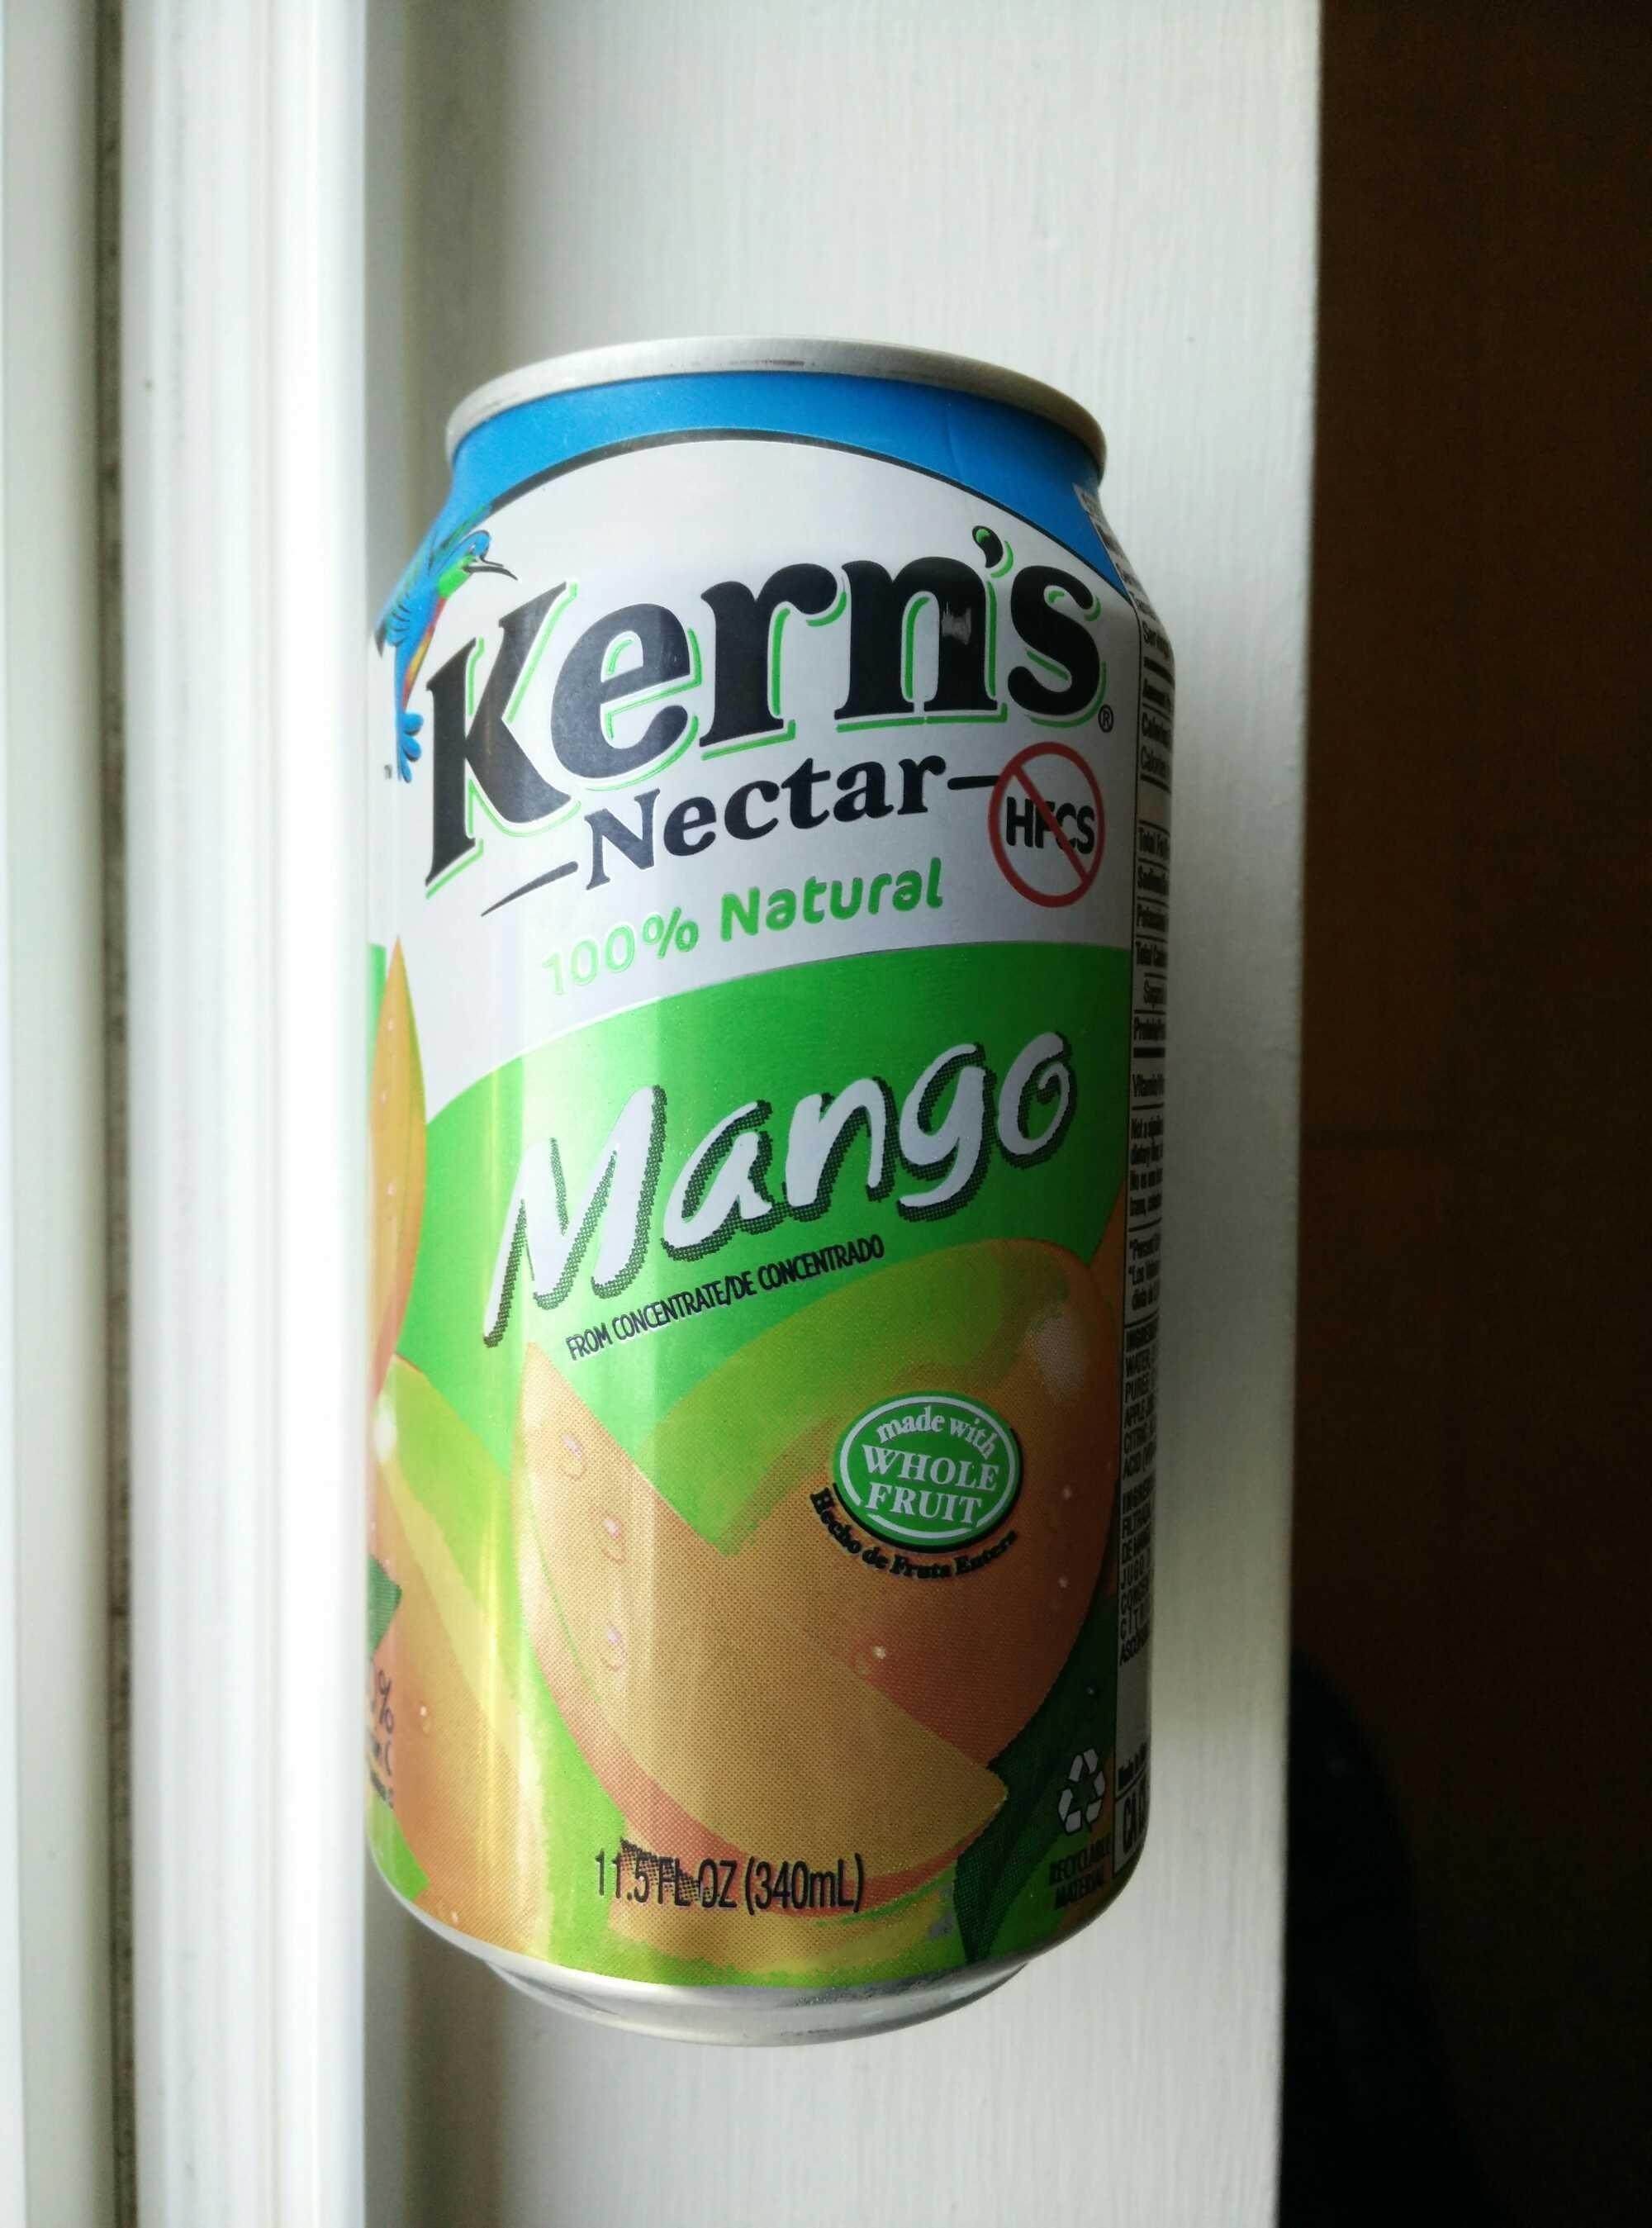 Mango - Product - en